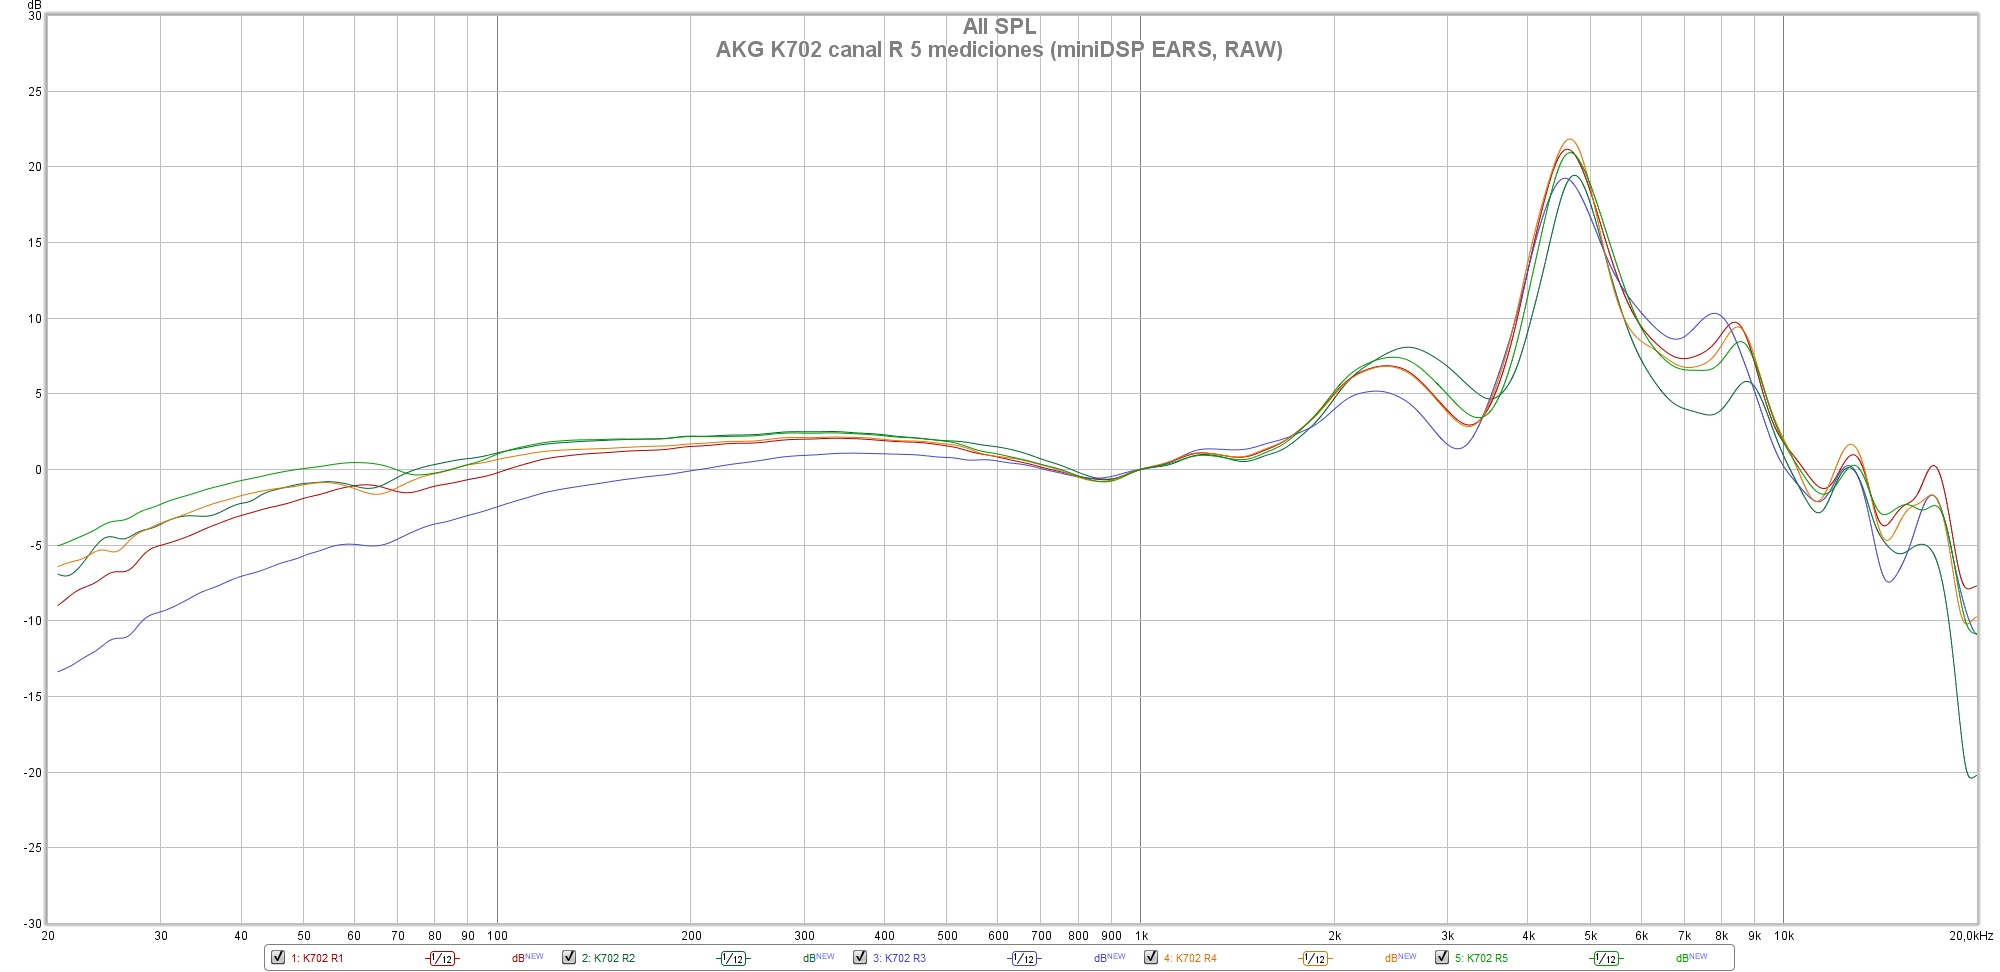 AKG K702 canal R 5 mediciones (miniDSP EARS, RAW)